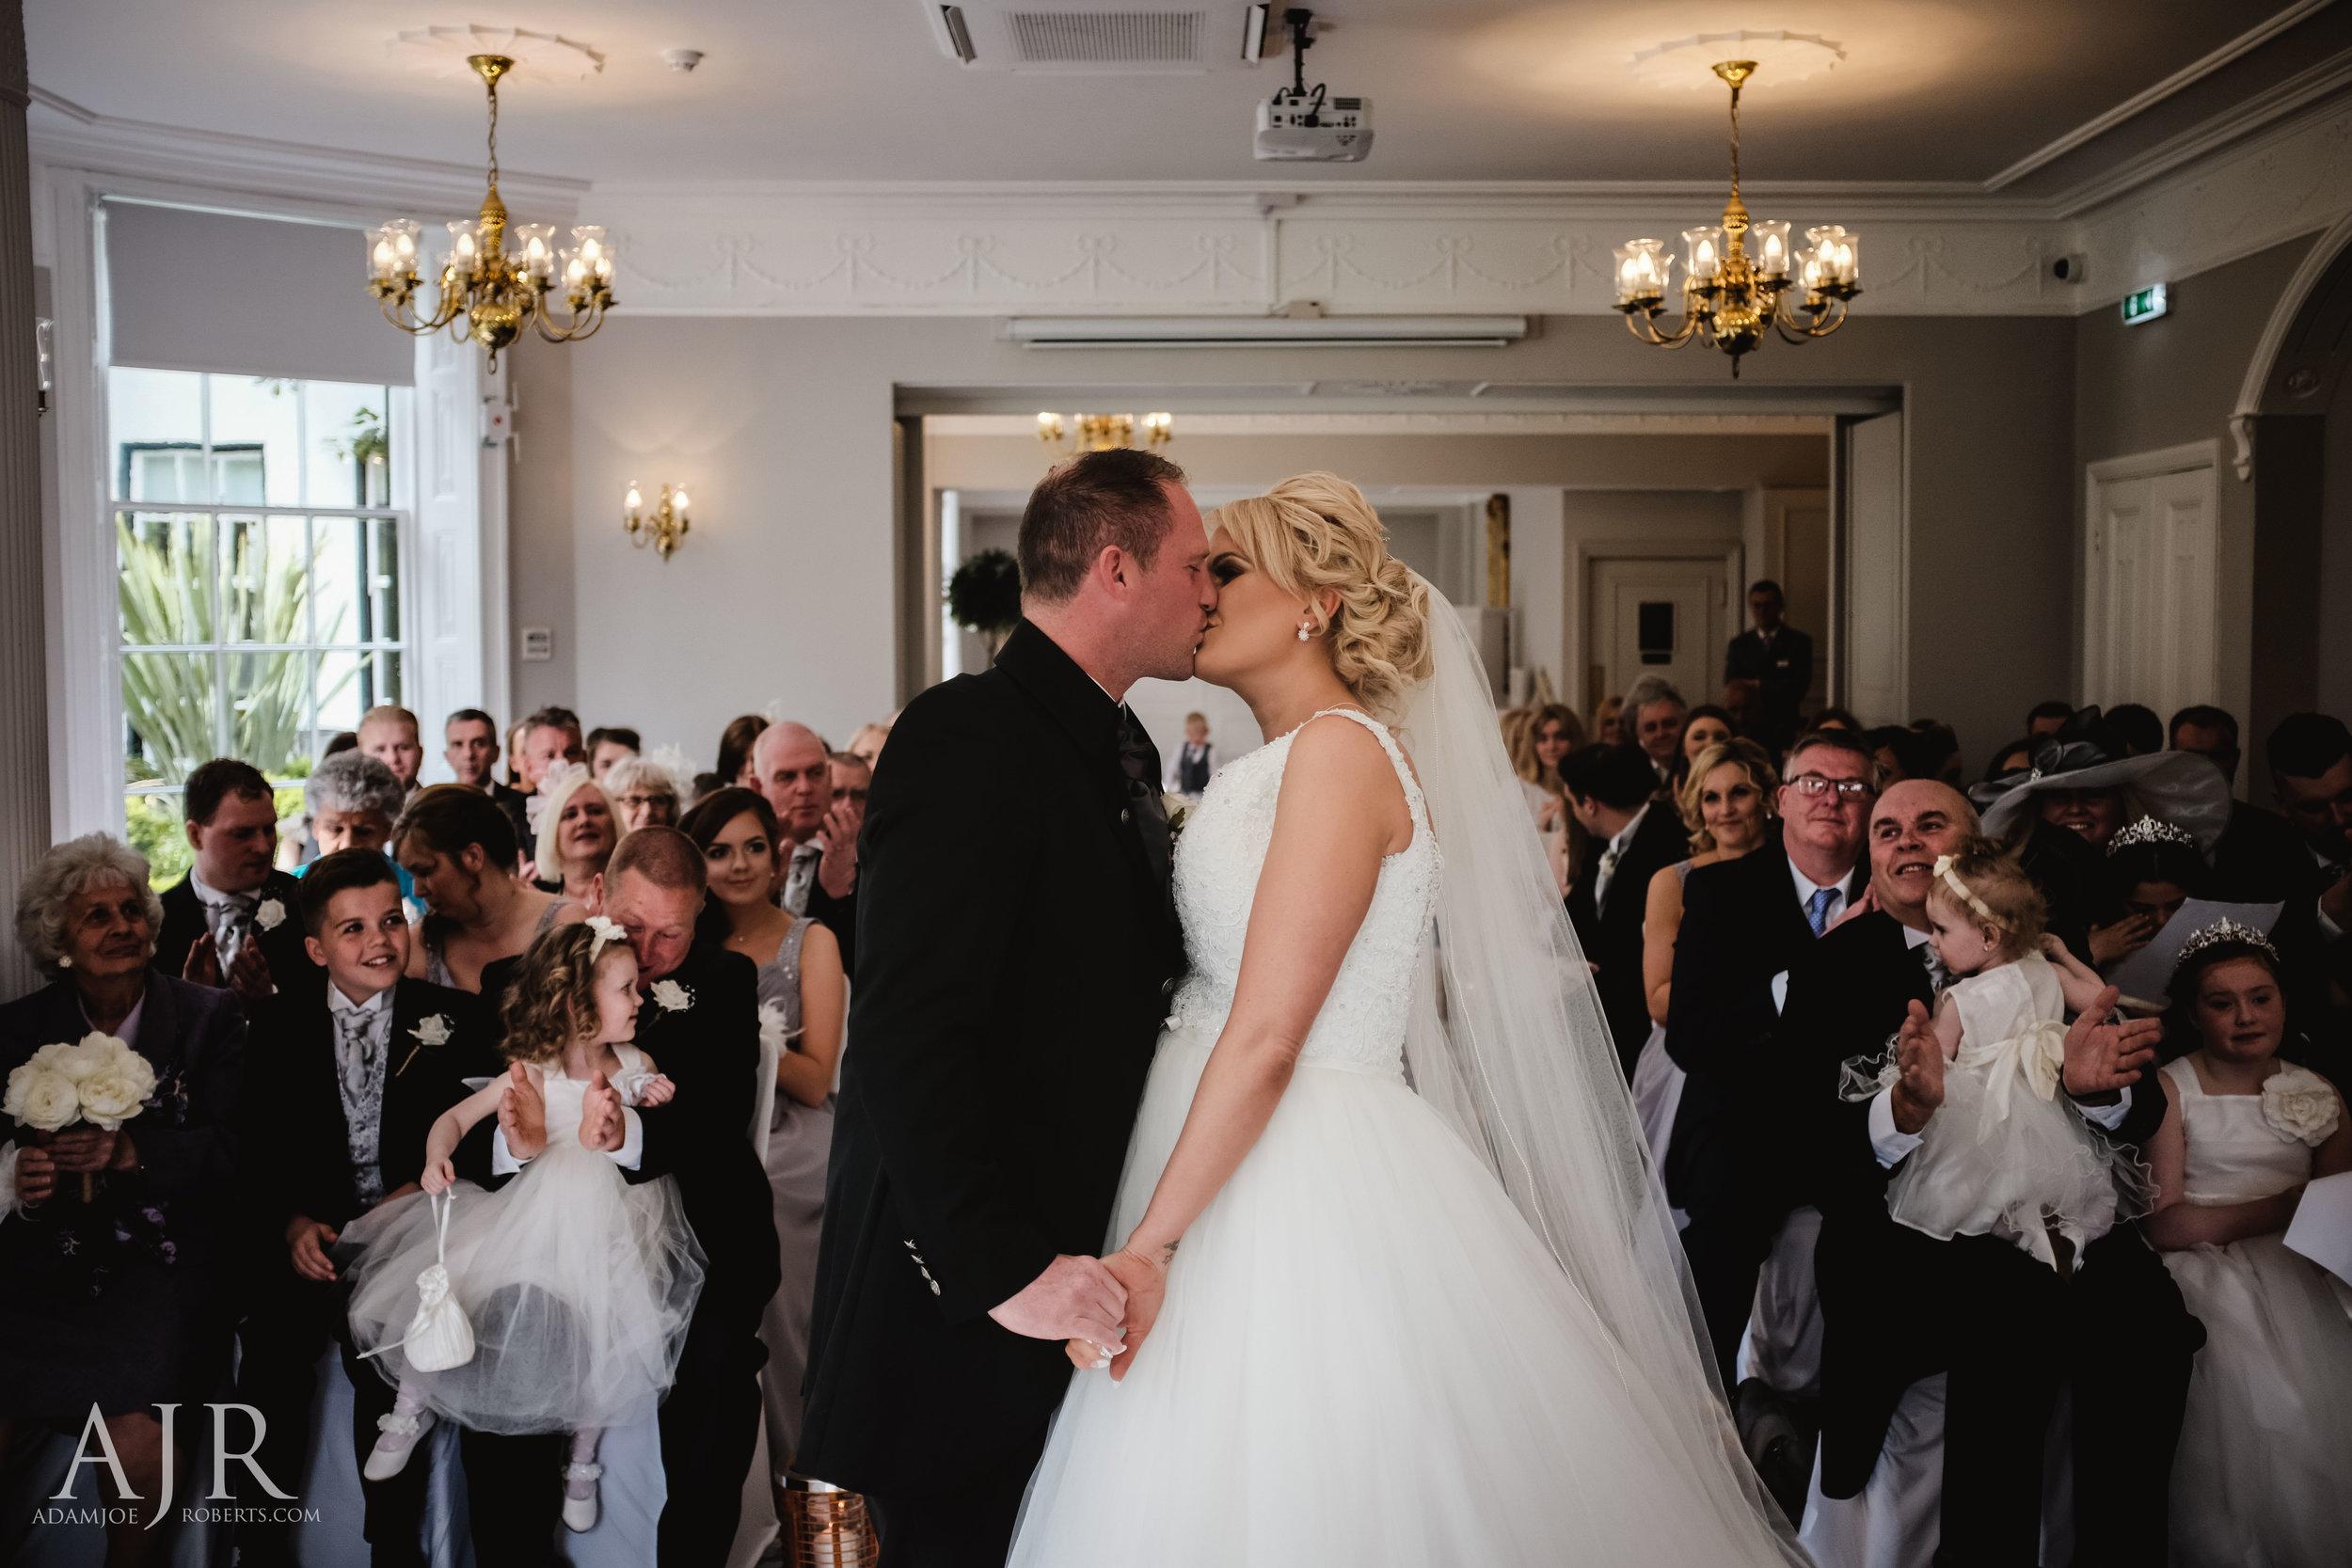 statham lodge wedding photographer cheshire wedding photographer (8 of 11).jpg